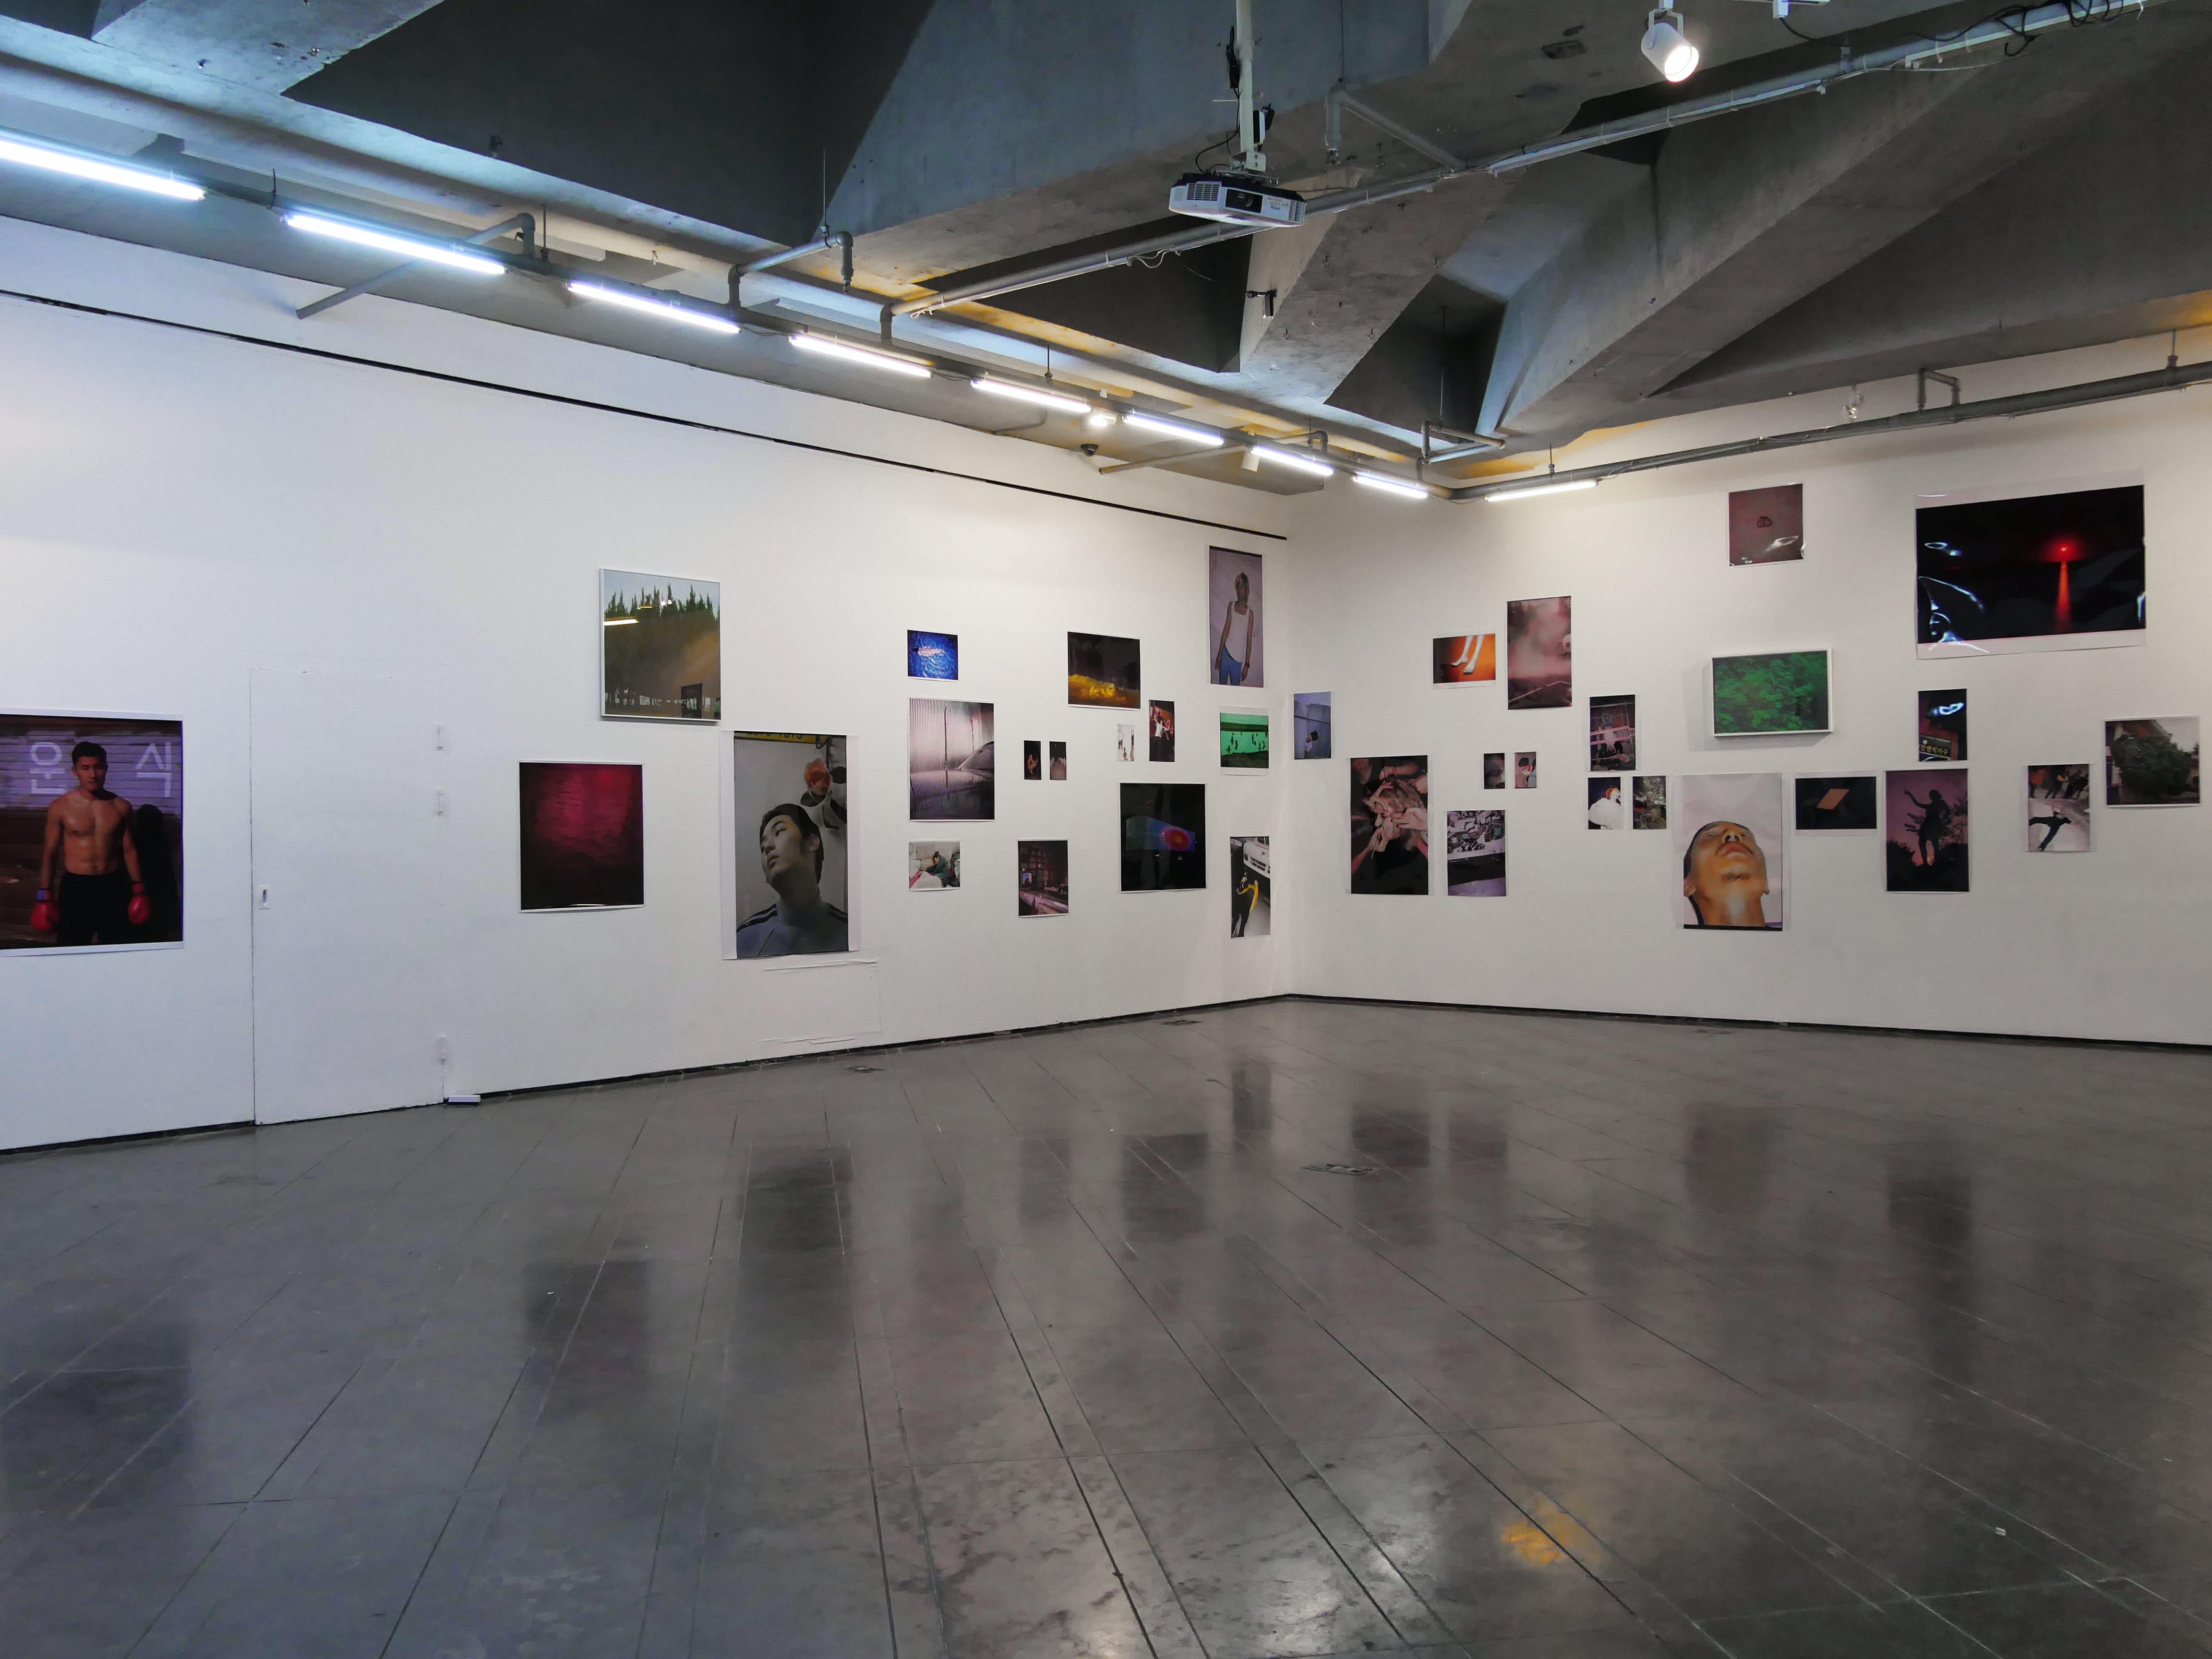 LESS Solo Exhibition: RAWTEENSTAR